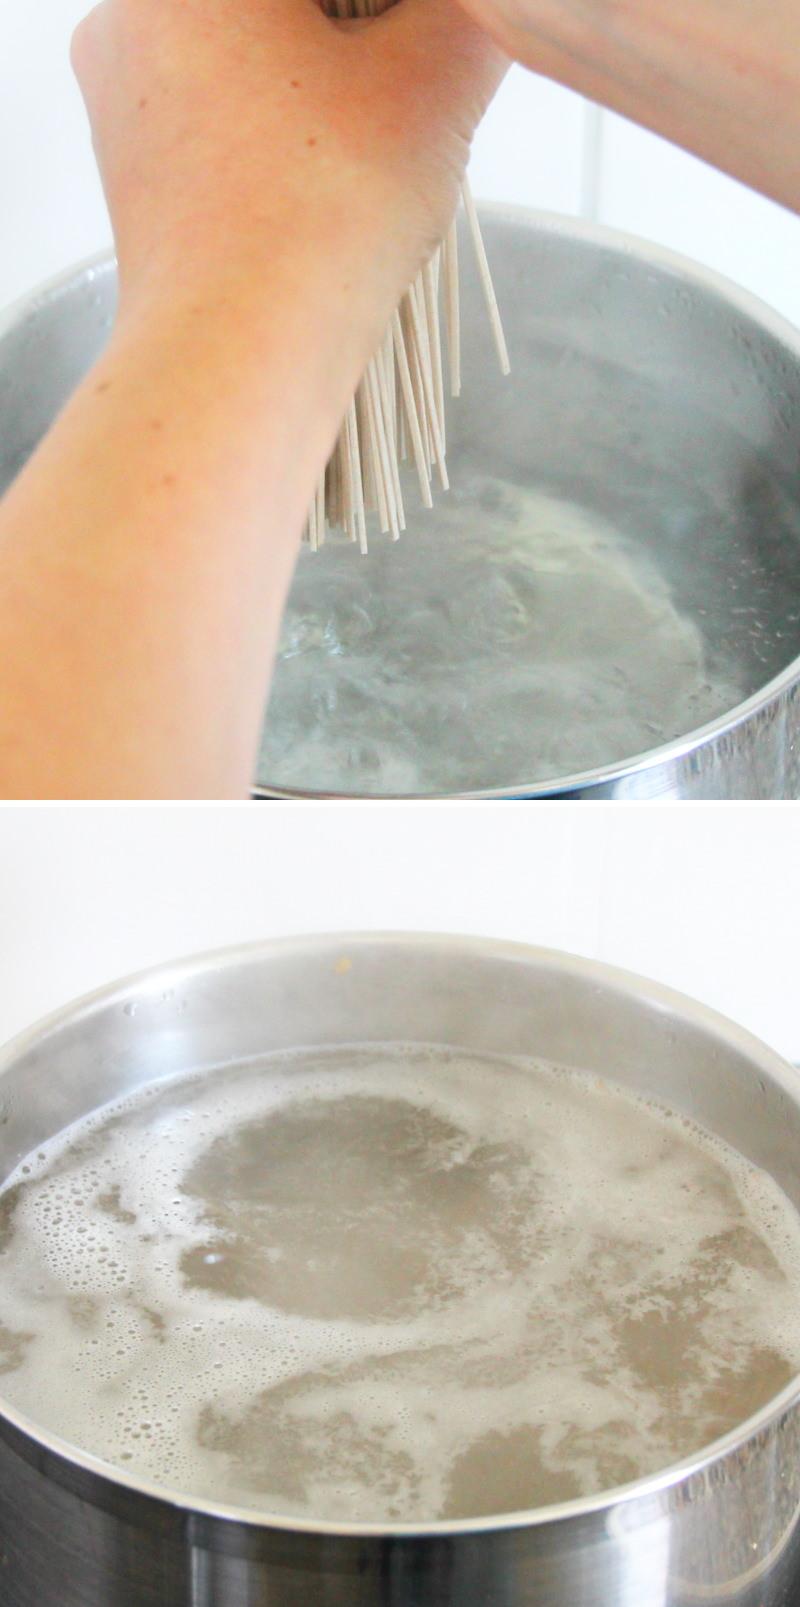 Kake Soba Schritt 5 Soba kochen